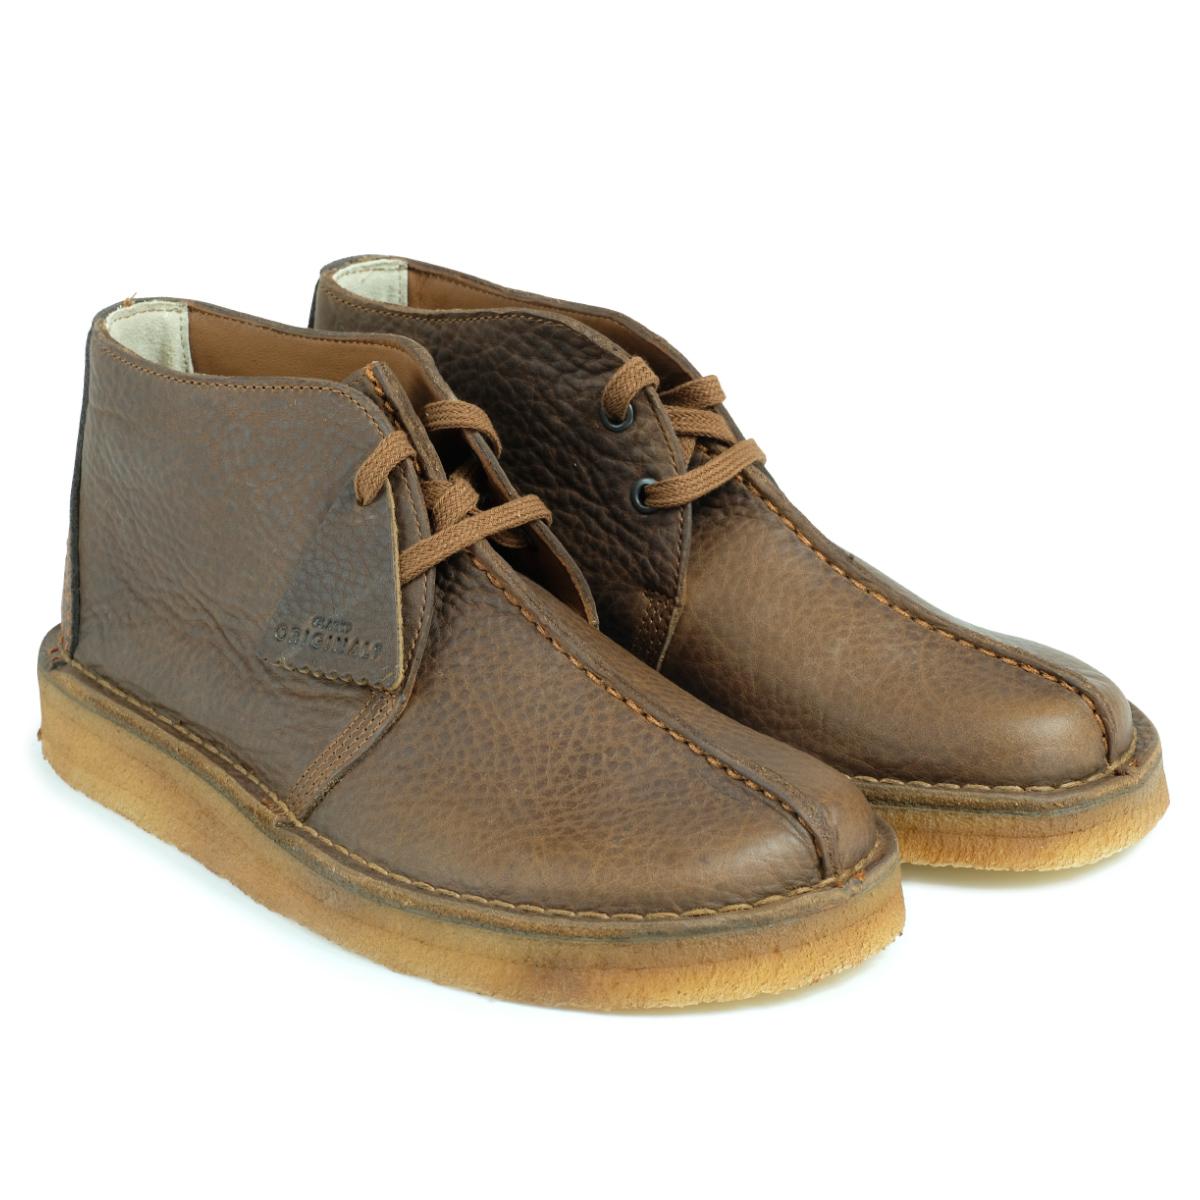 cb2a8db0cf Clarks DESERT TREK HI kulaki dessert trek boots men 26128364 shoes brown  [load planned Shinnyu load in reservation product 10/23 containing] [1710]